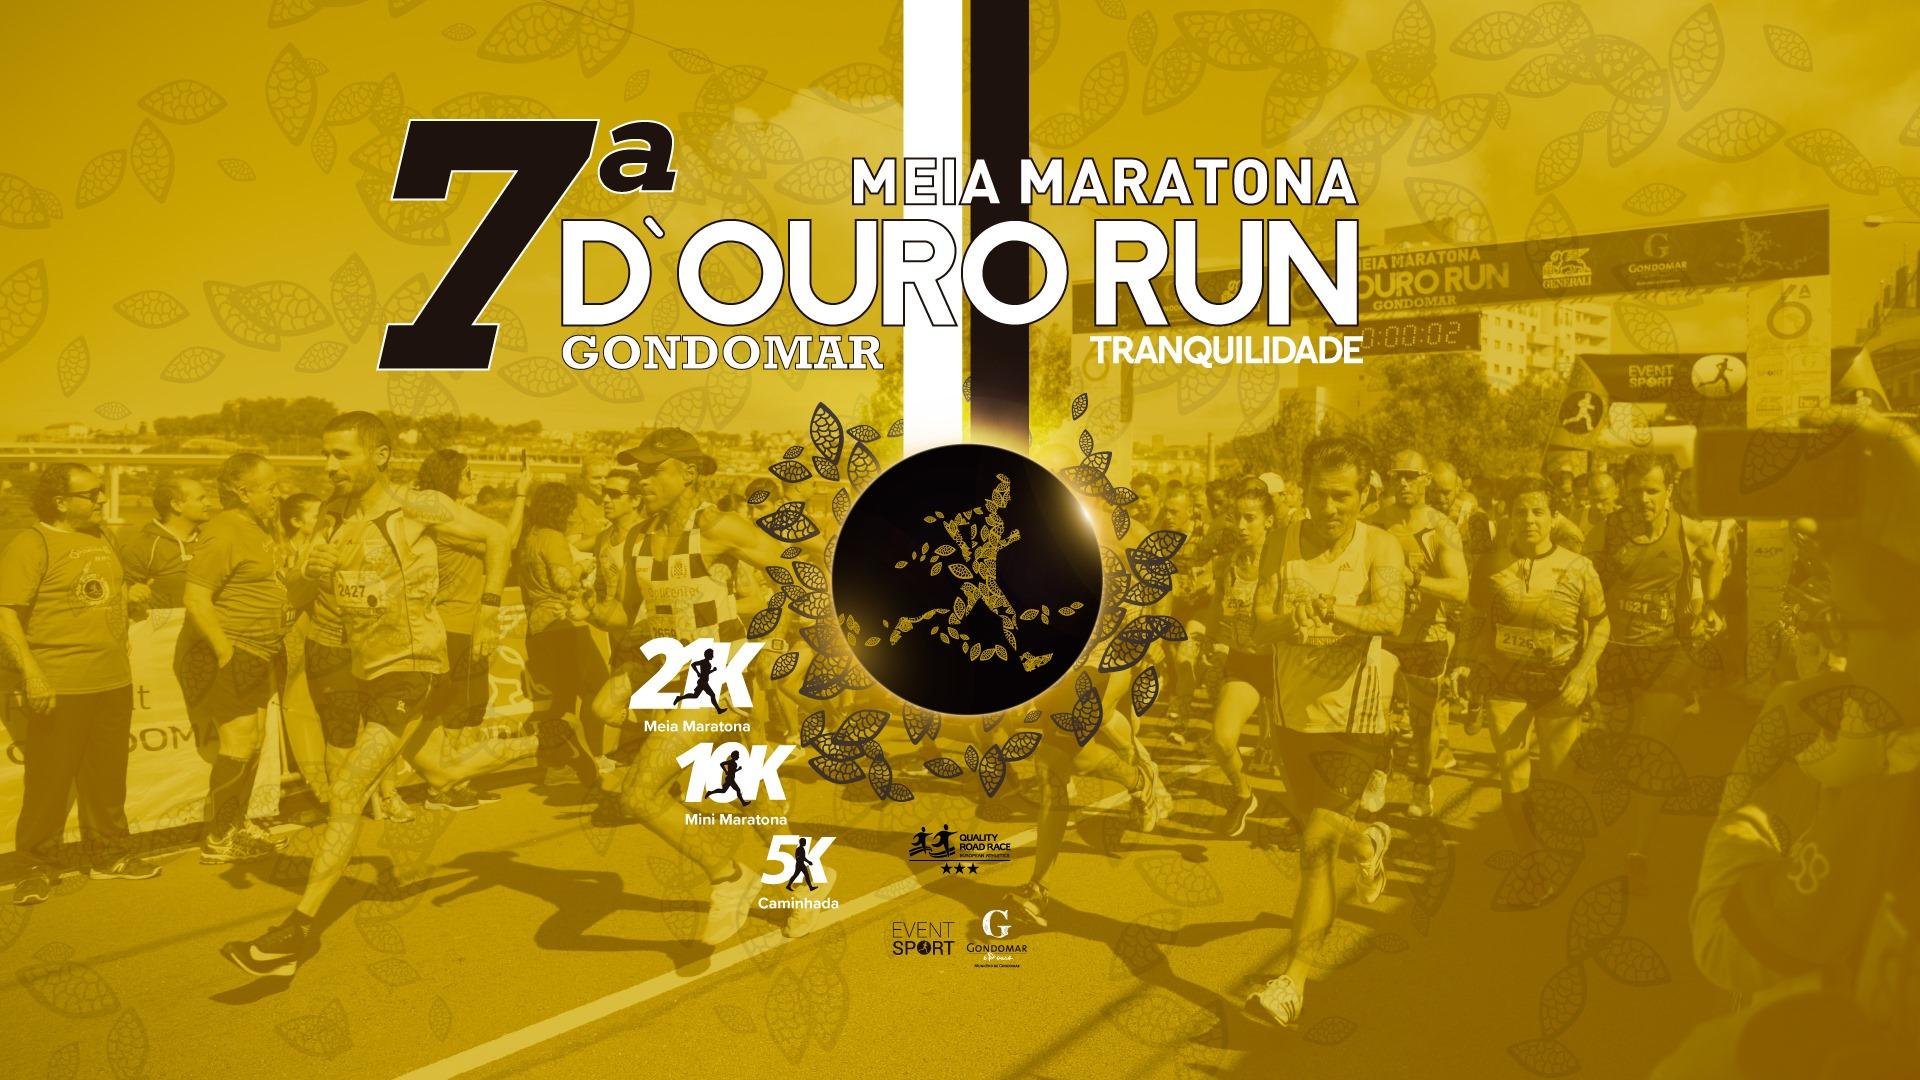 7ª Meia Maratona D`Ouro Run Gondomar Tranquilidade